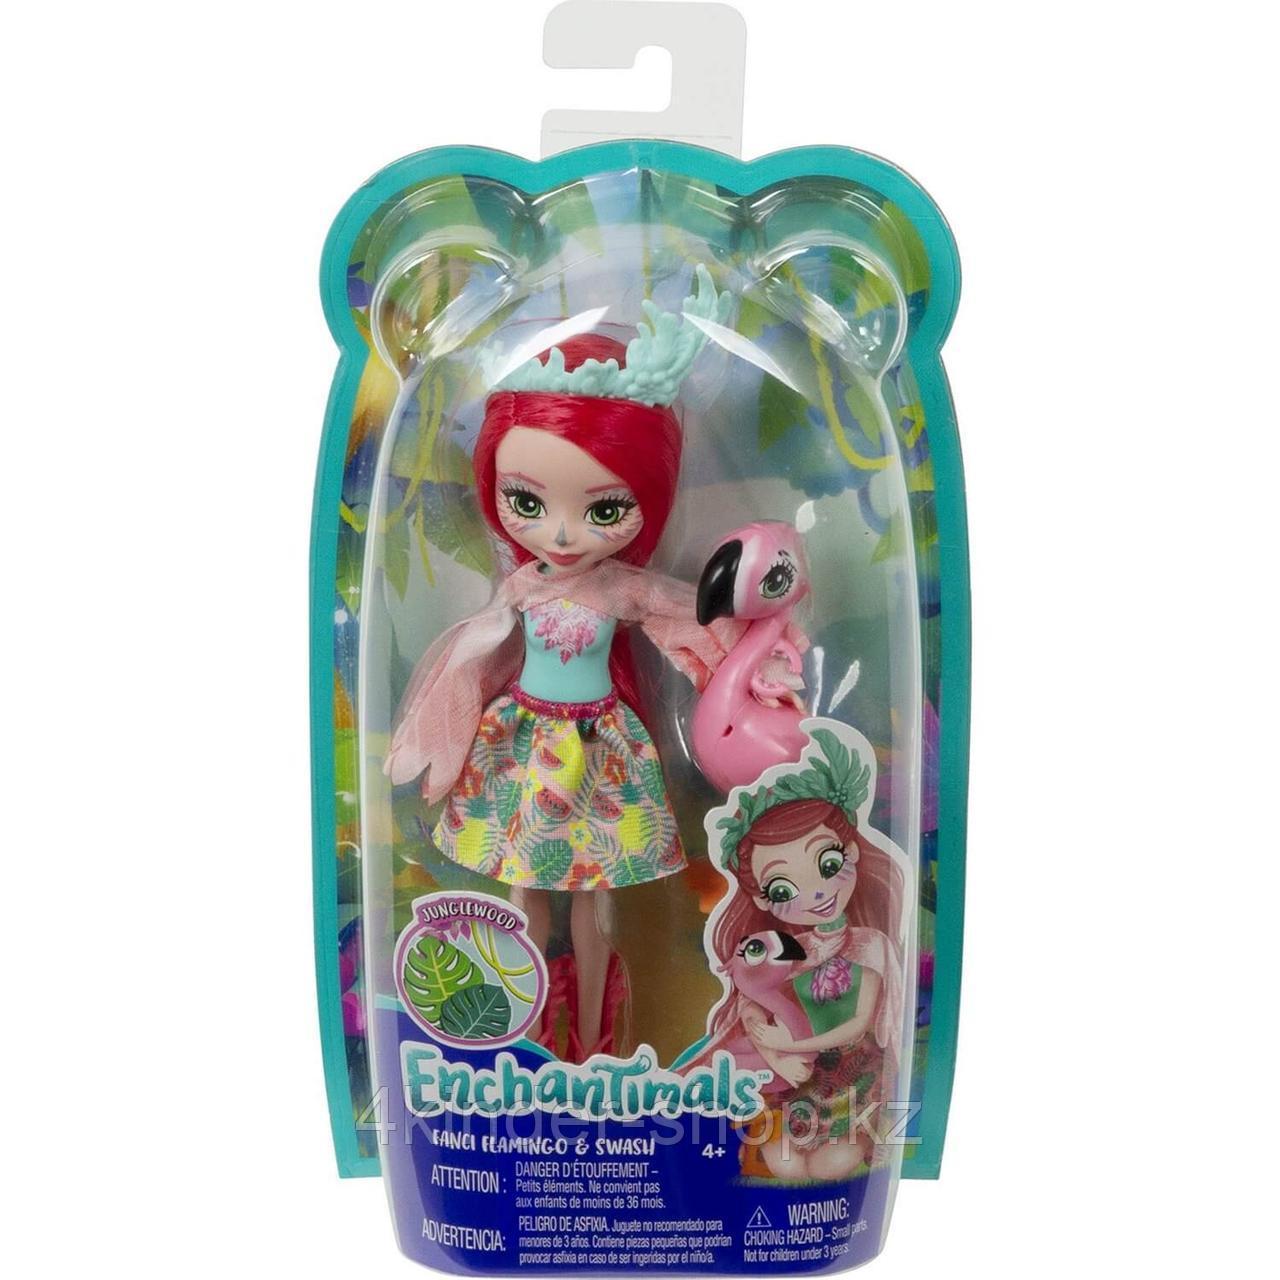 Энчантималс Enchantimals кукла с питомцем Фэнси Флэминг и Свош GFN42 - фото 1